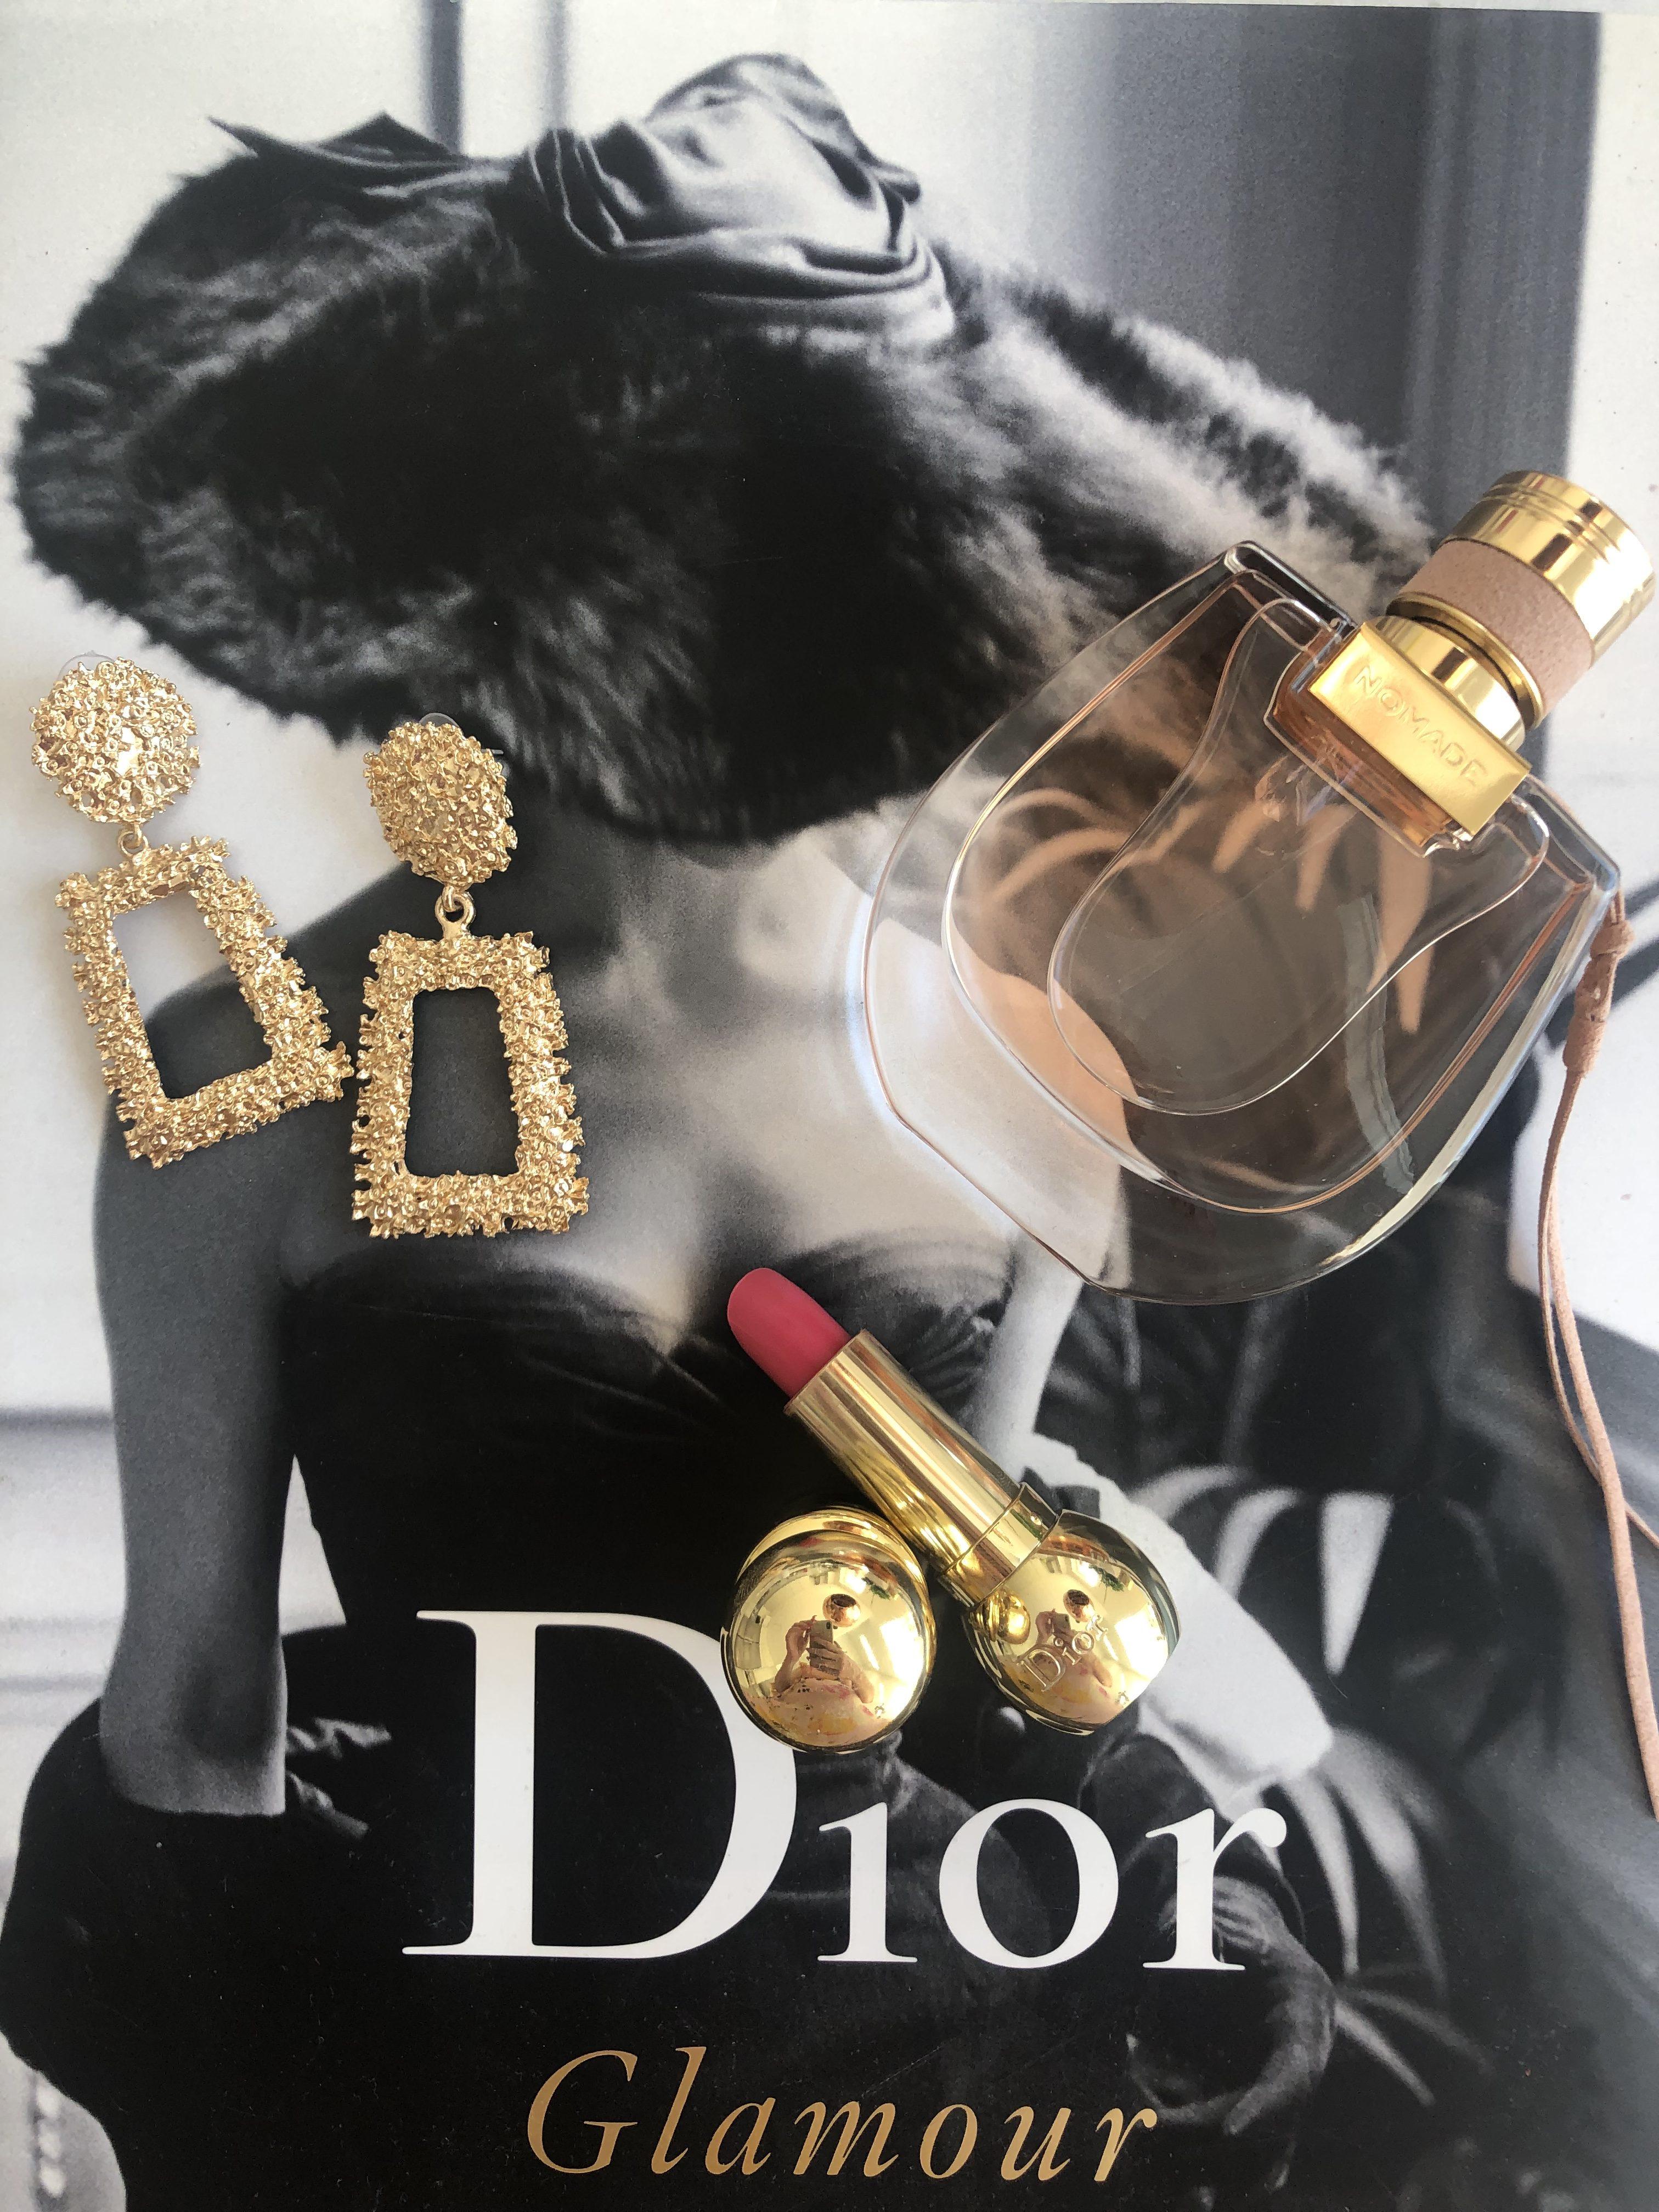 Chloé Nomade EdP parfym